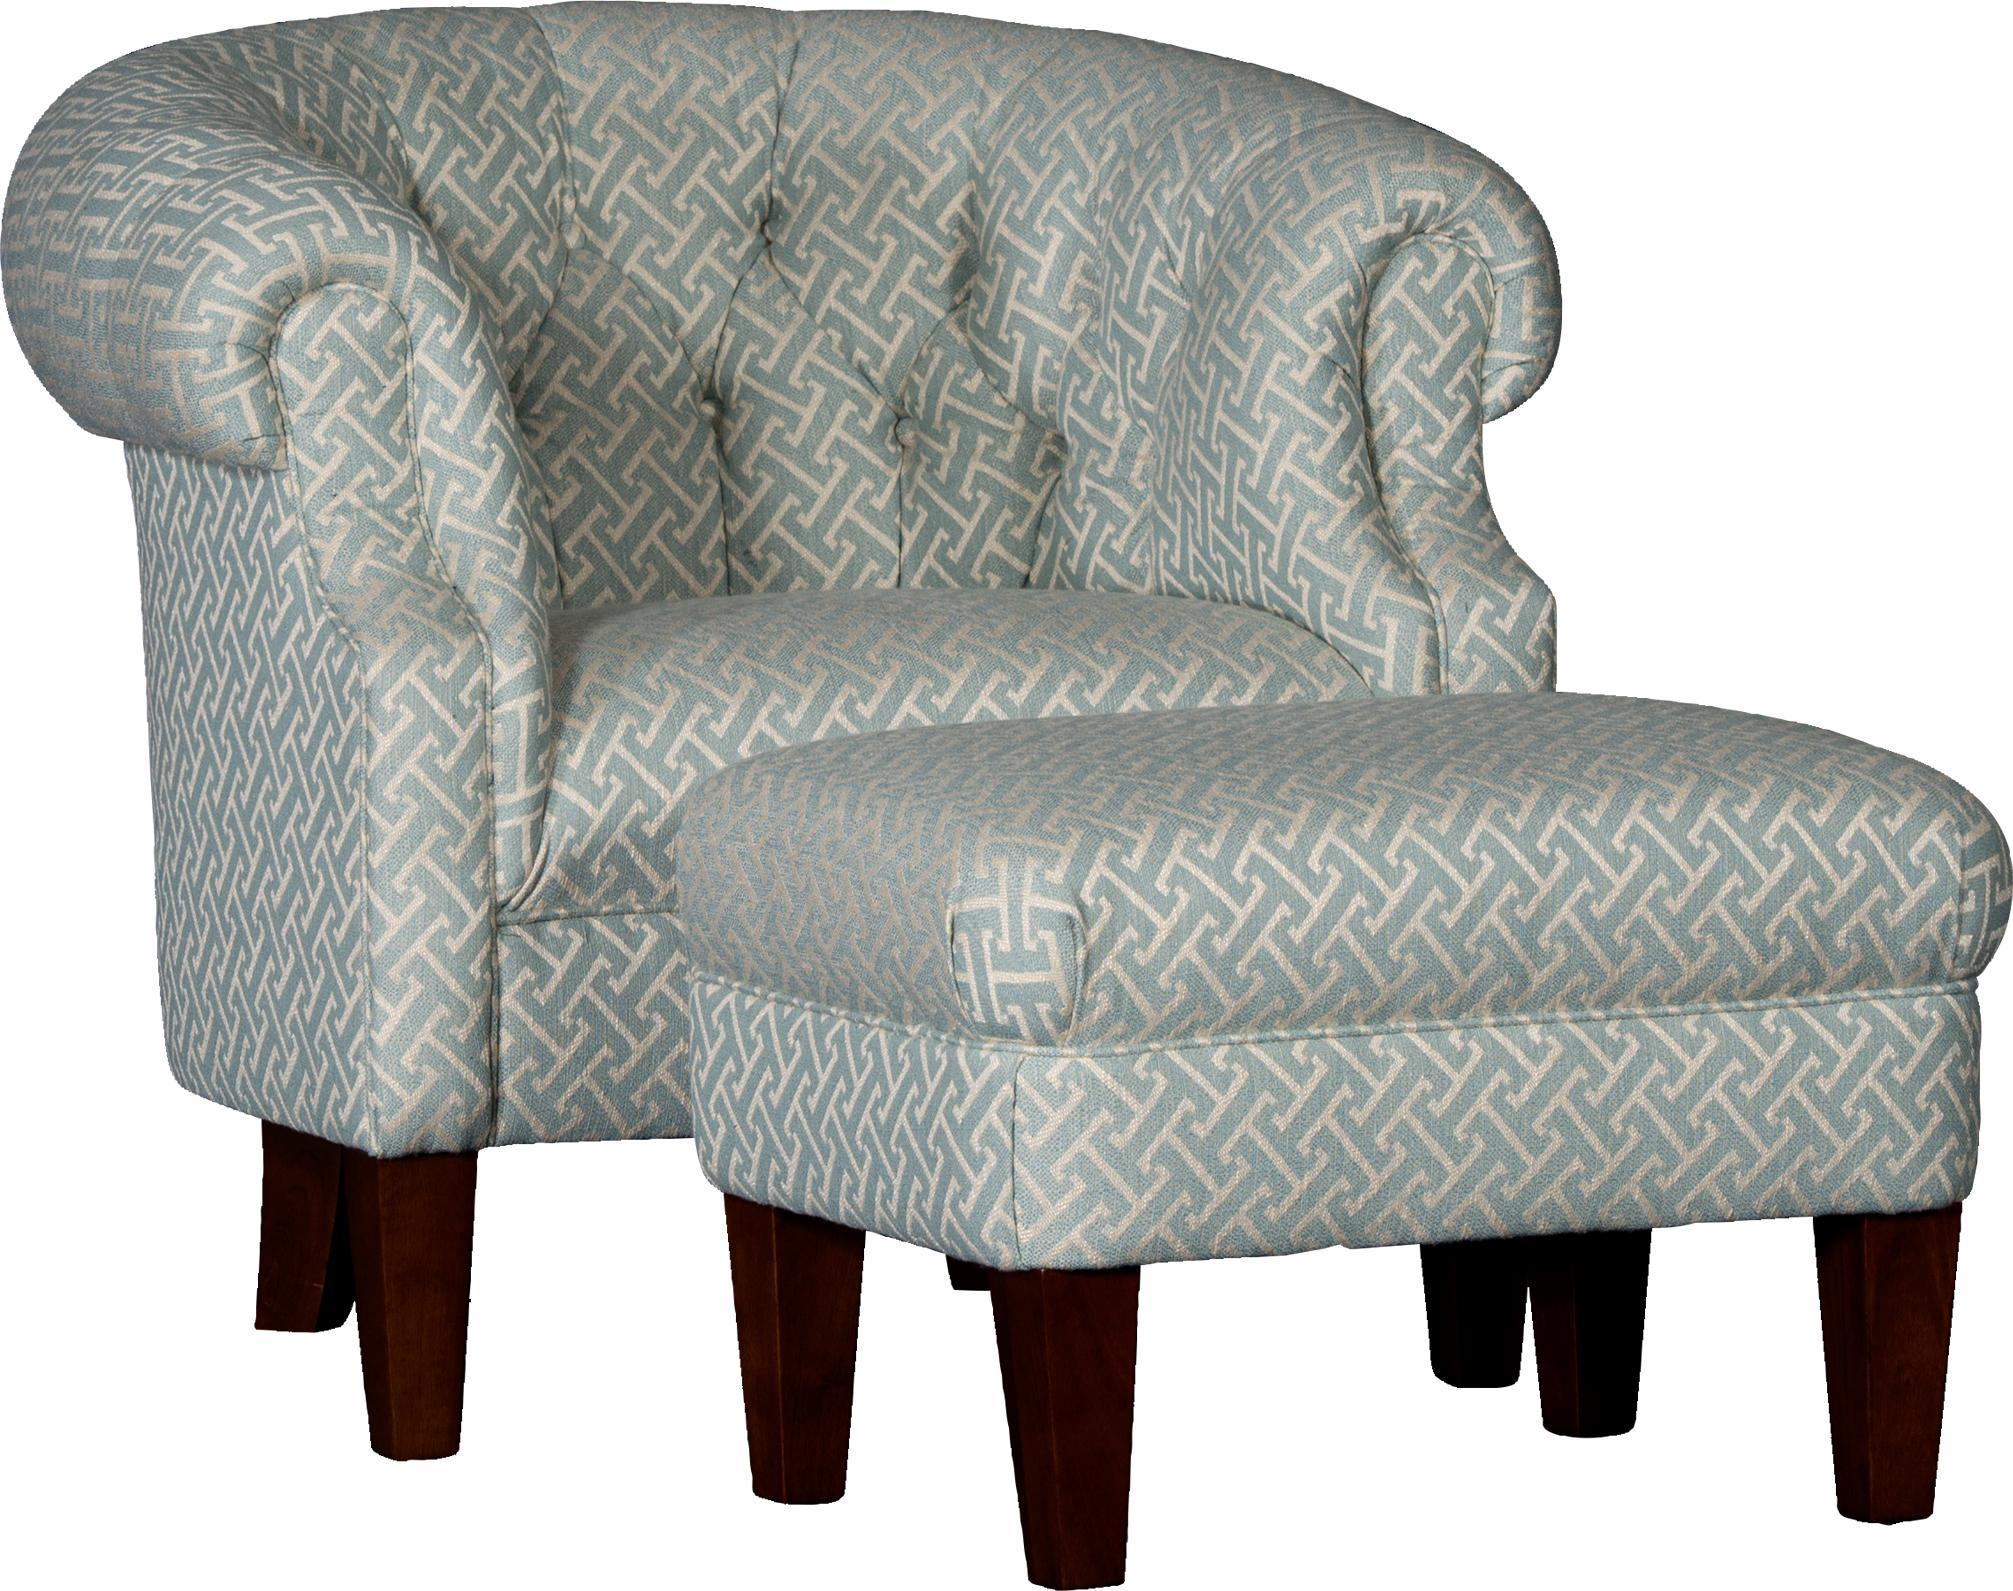 8220 Tub Chair & Ottoman Set by Mayo at Pedigo Furniture